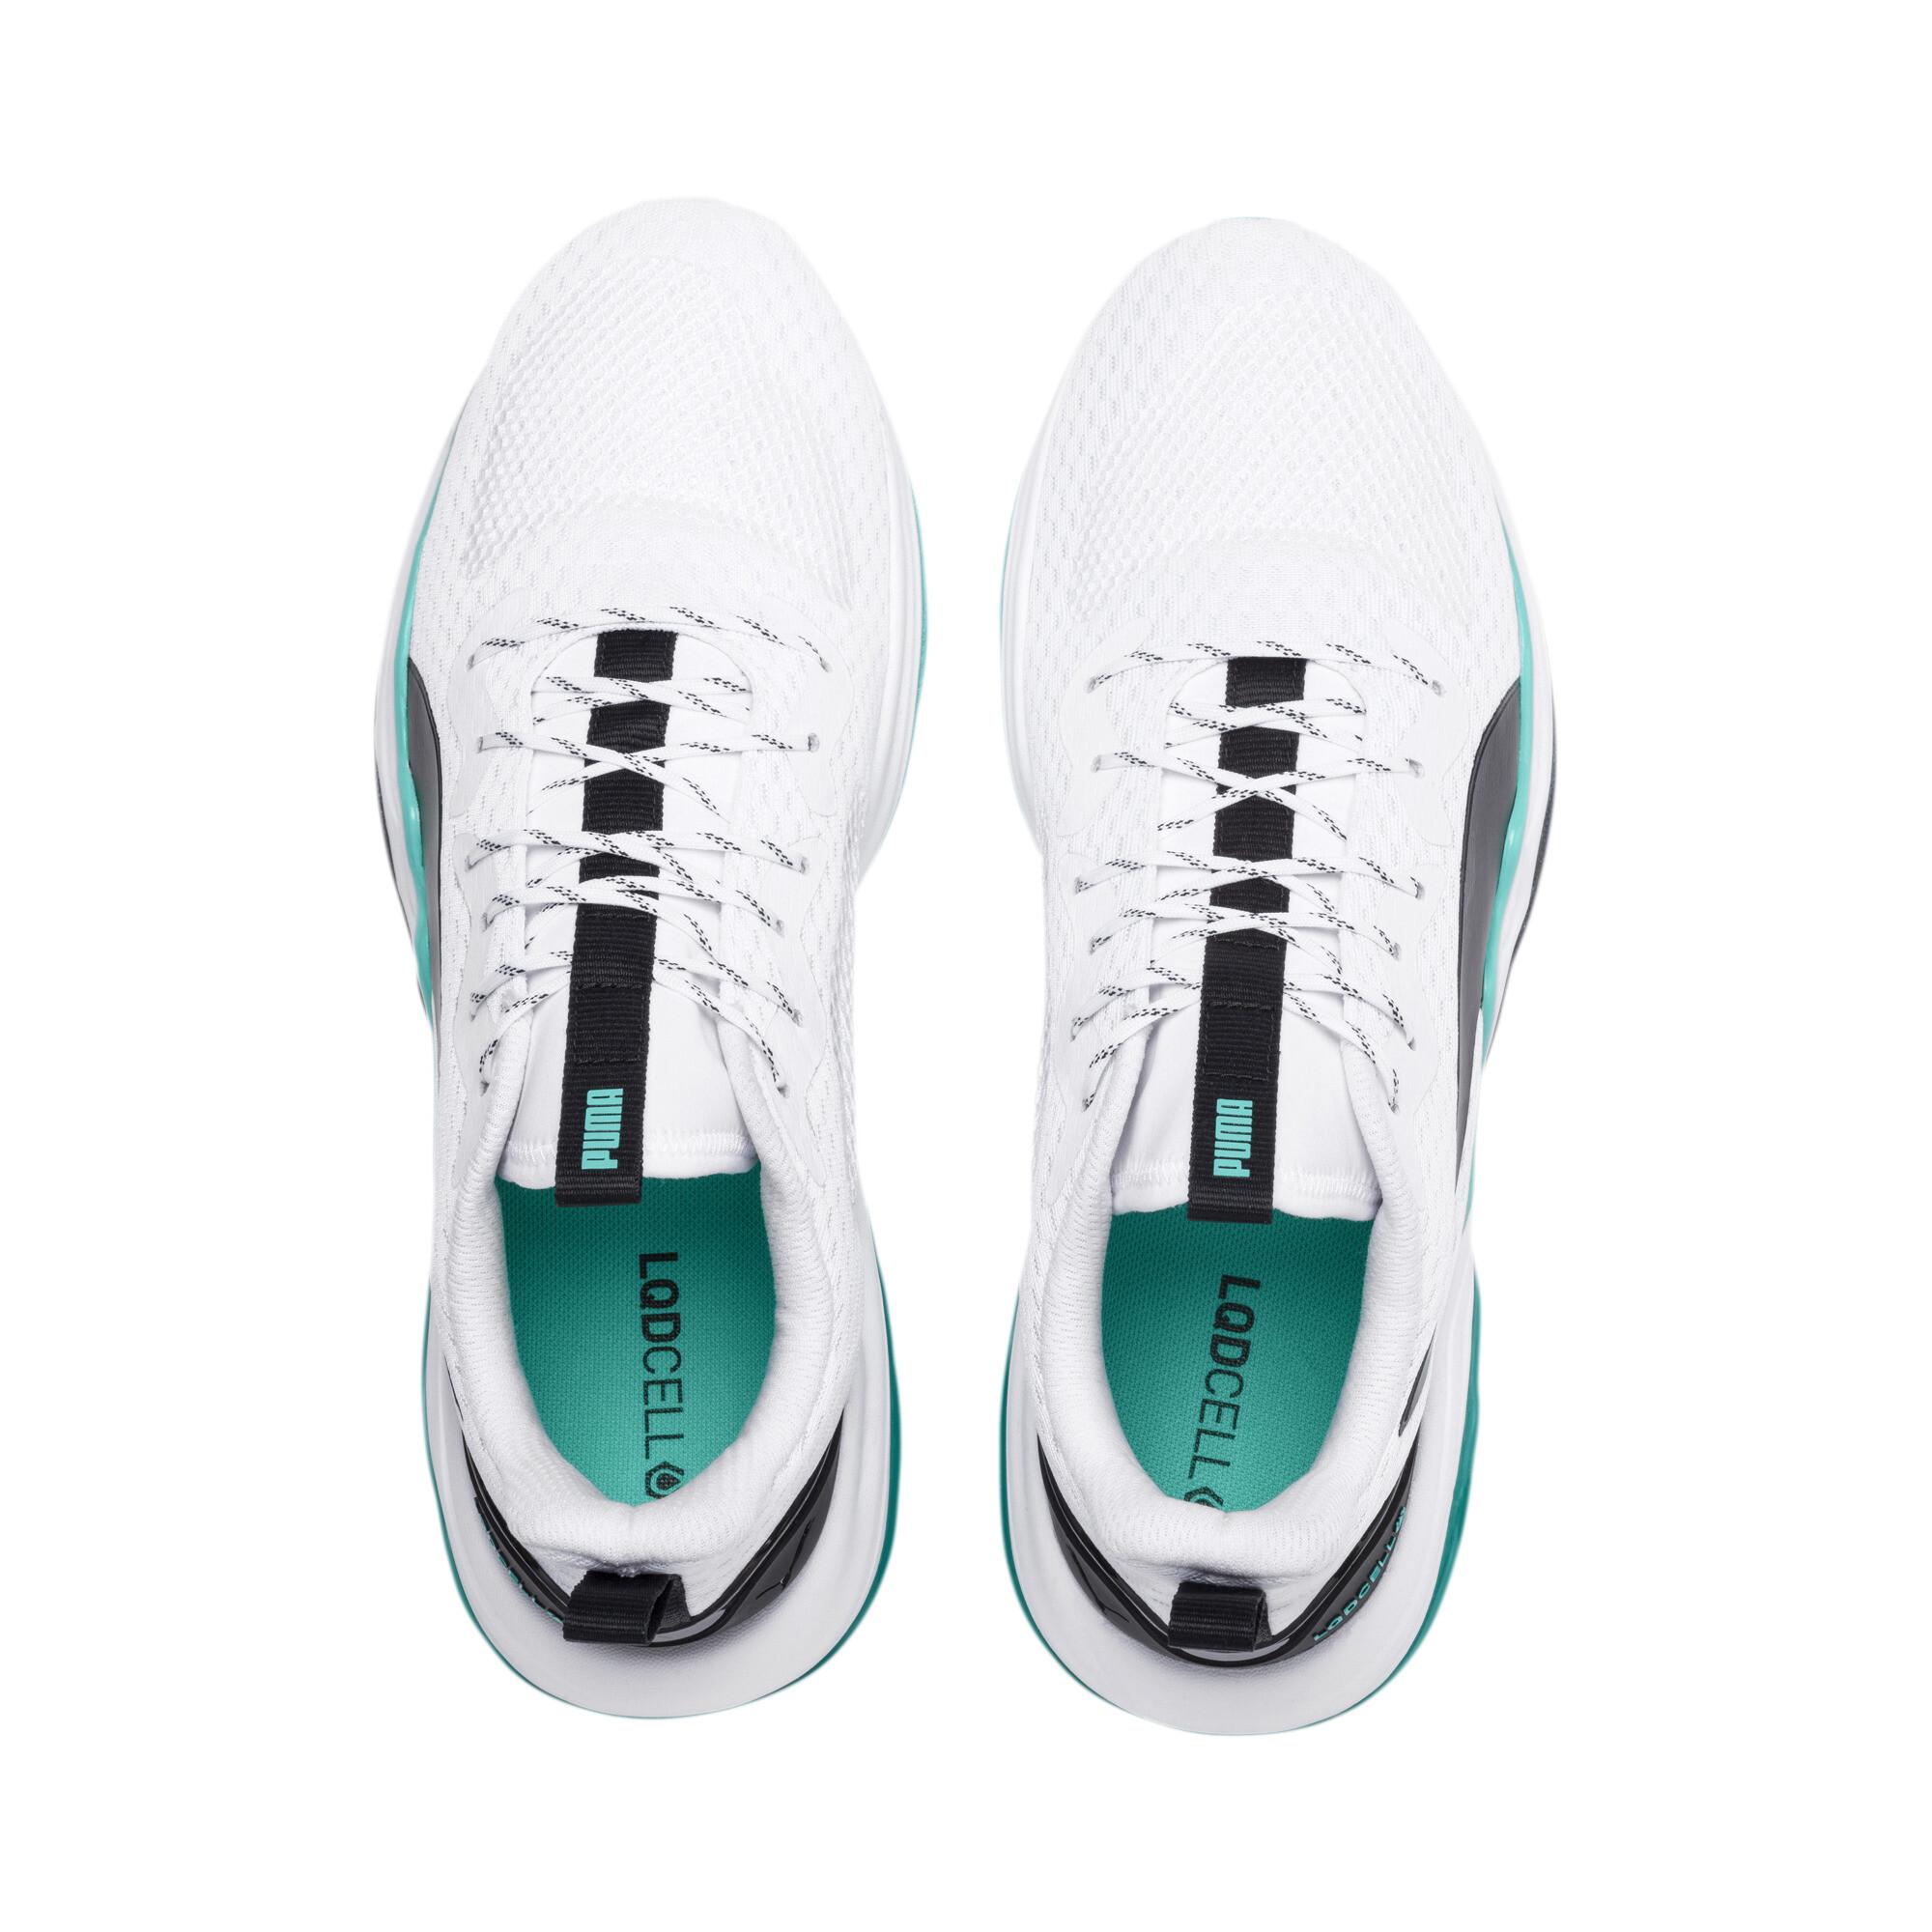 PUMA-LQDCELL-Tension-Men-039-s-Training-Shoes-Men-Shoe-Training thumbnail 8